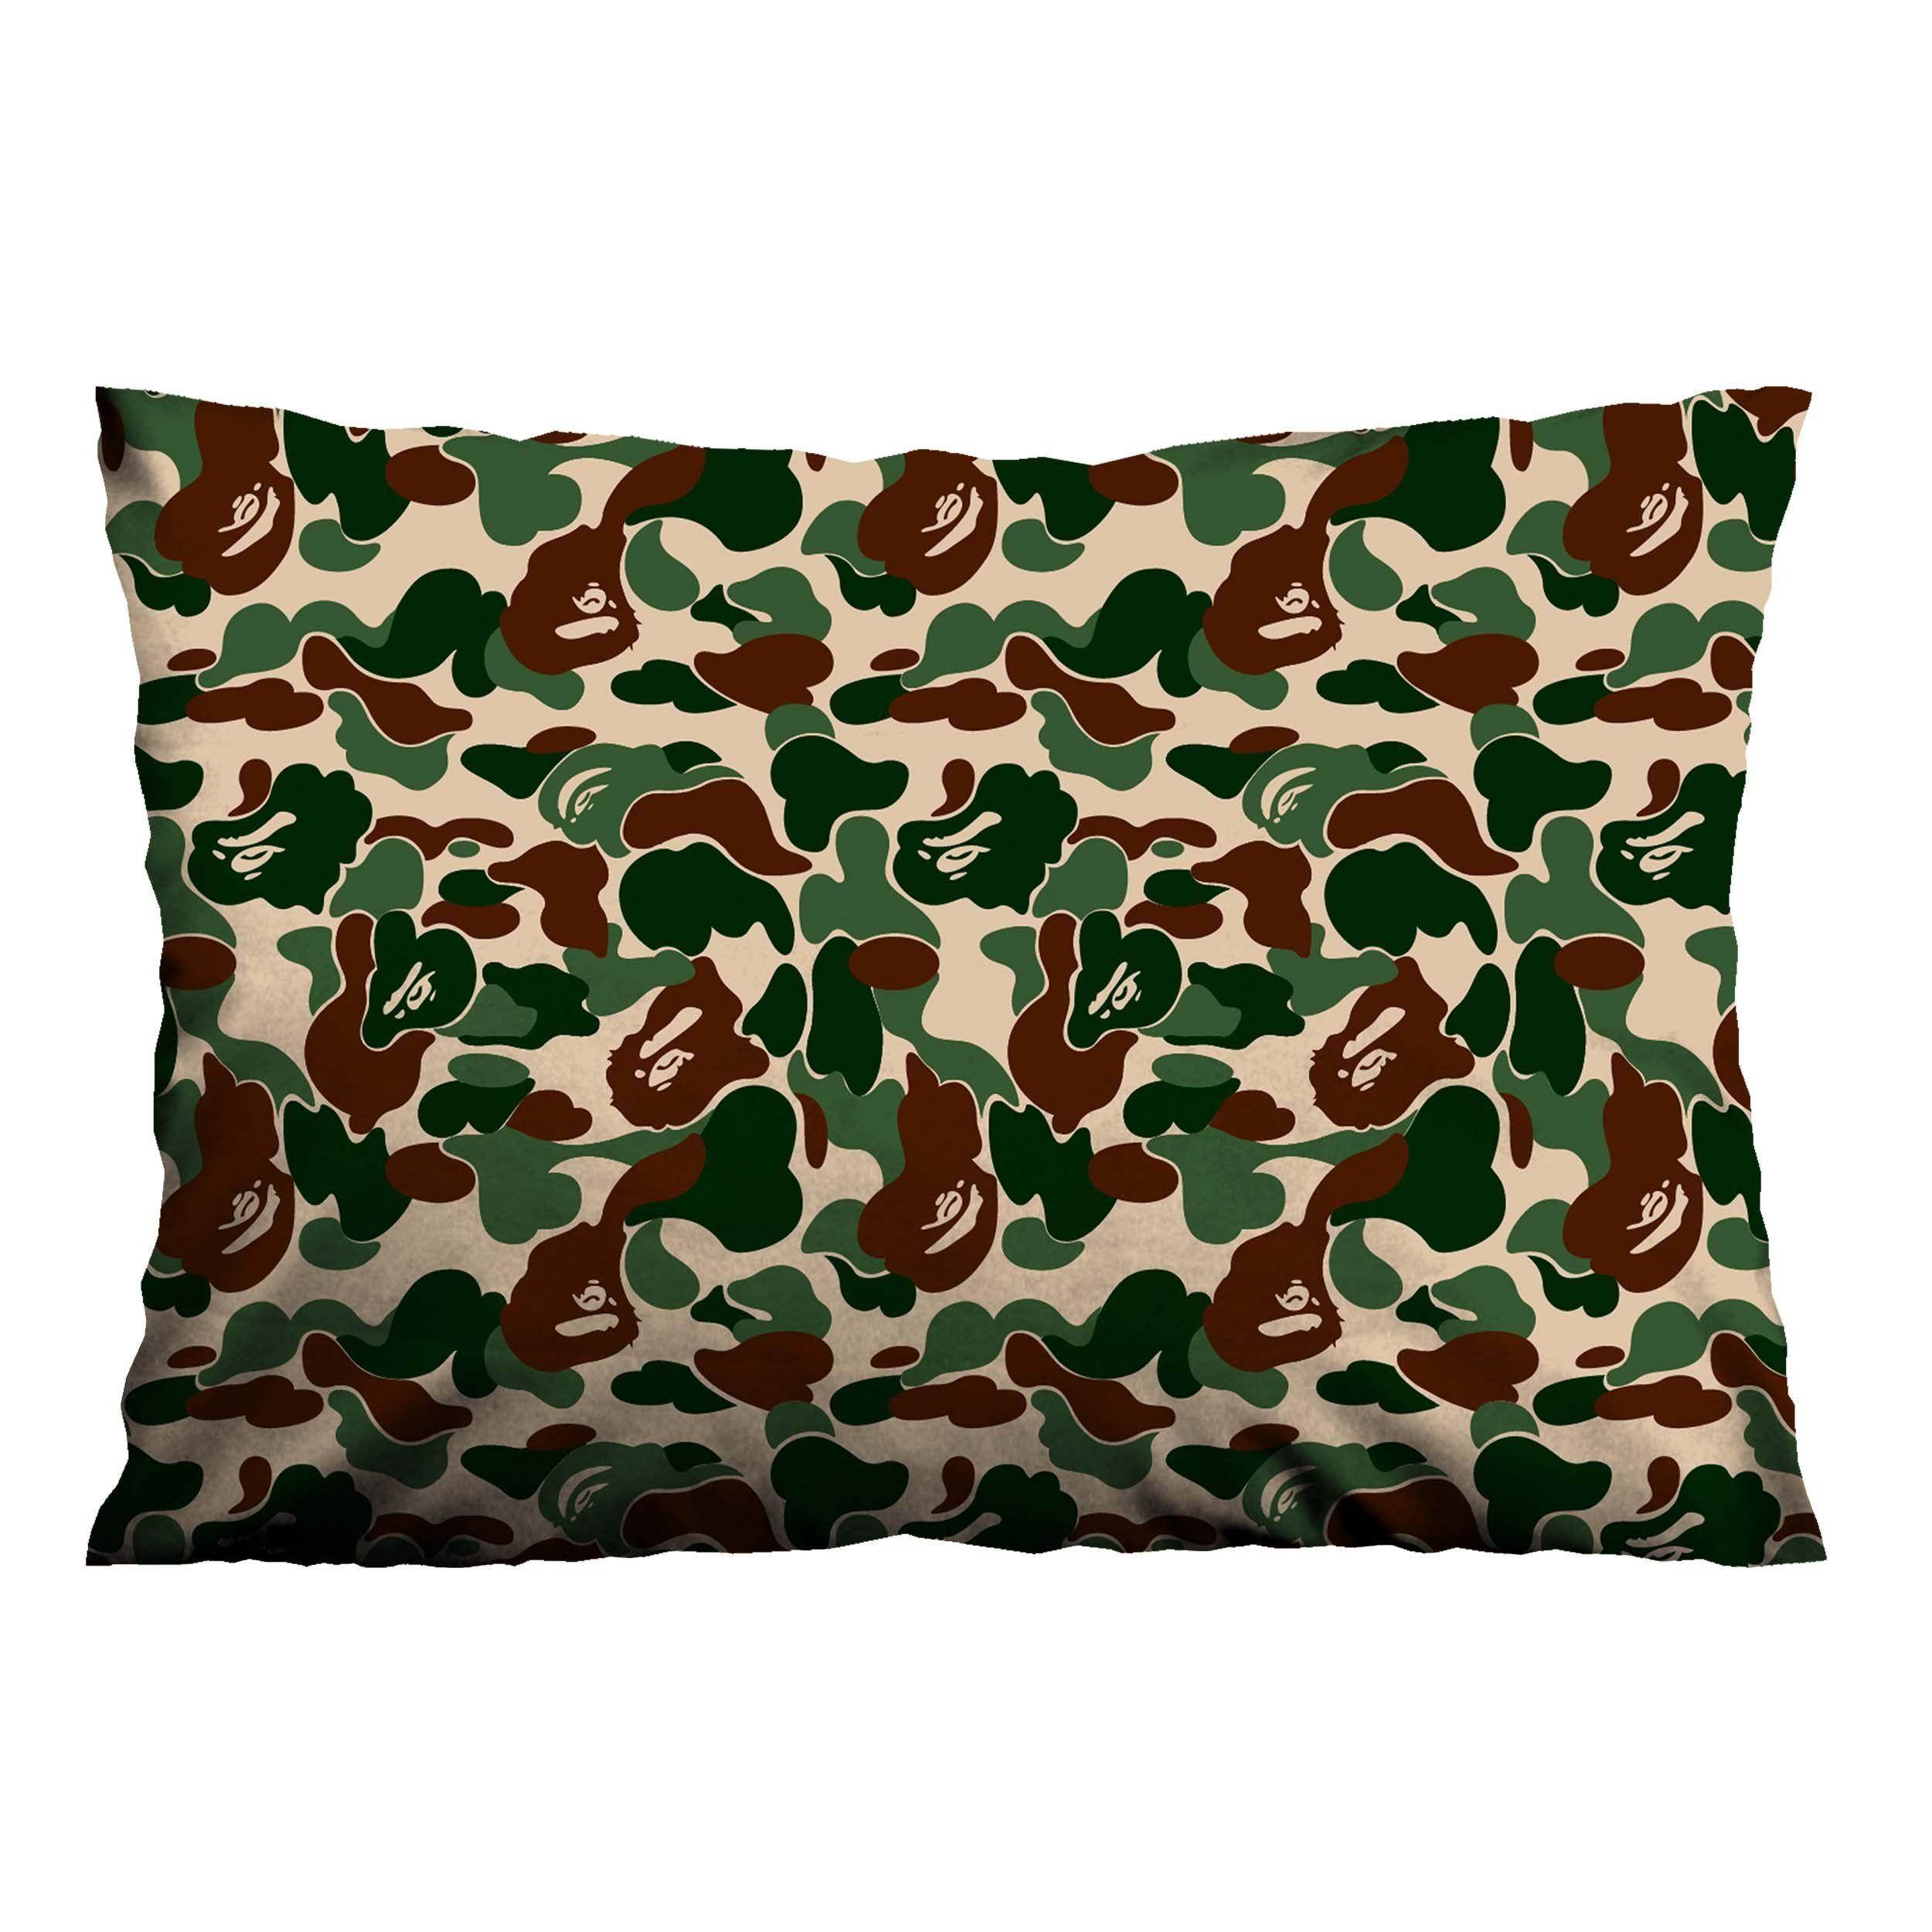 Bape Bathing Ape Camo Pillow Case Cover Casefine Bape Bathing Ape Camo Pillow Case Cover Vendor Casefine Type Green Pillow Cases Pillows Green Pillows